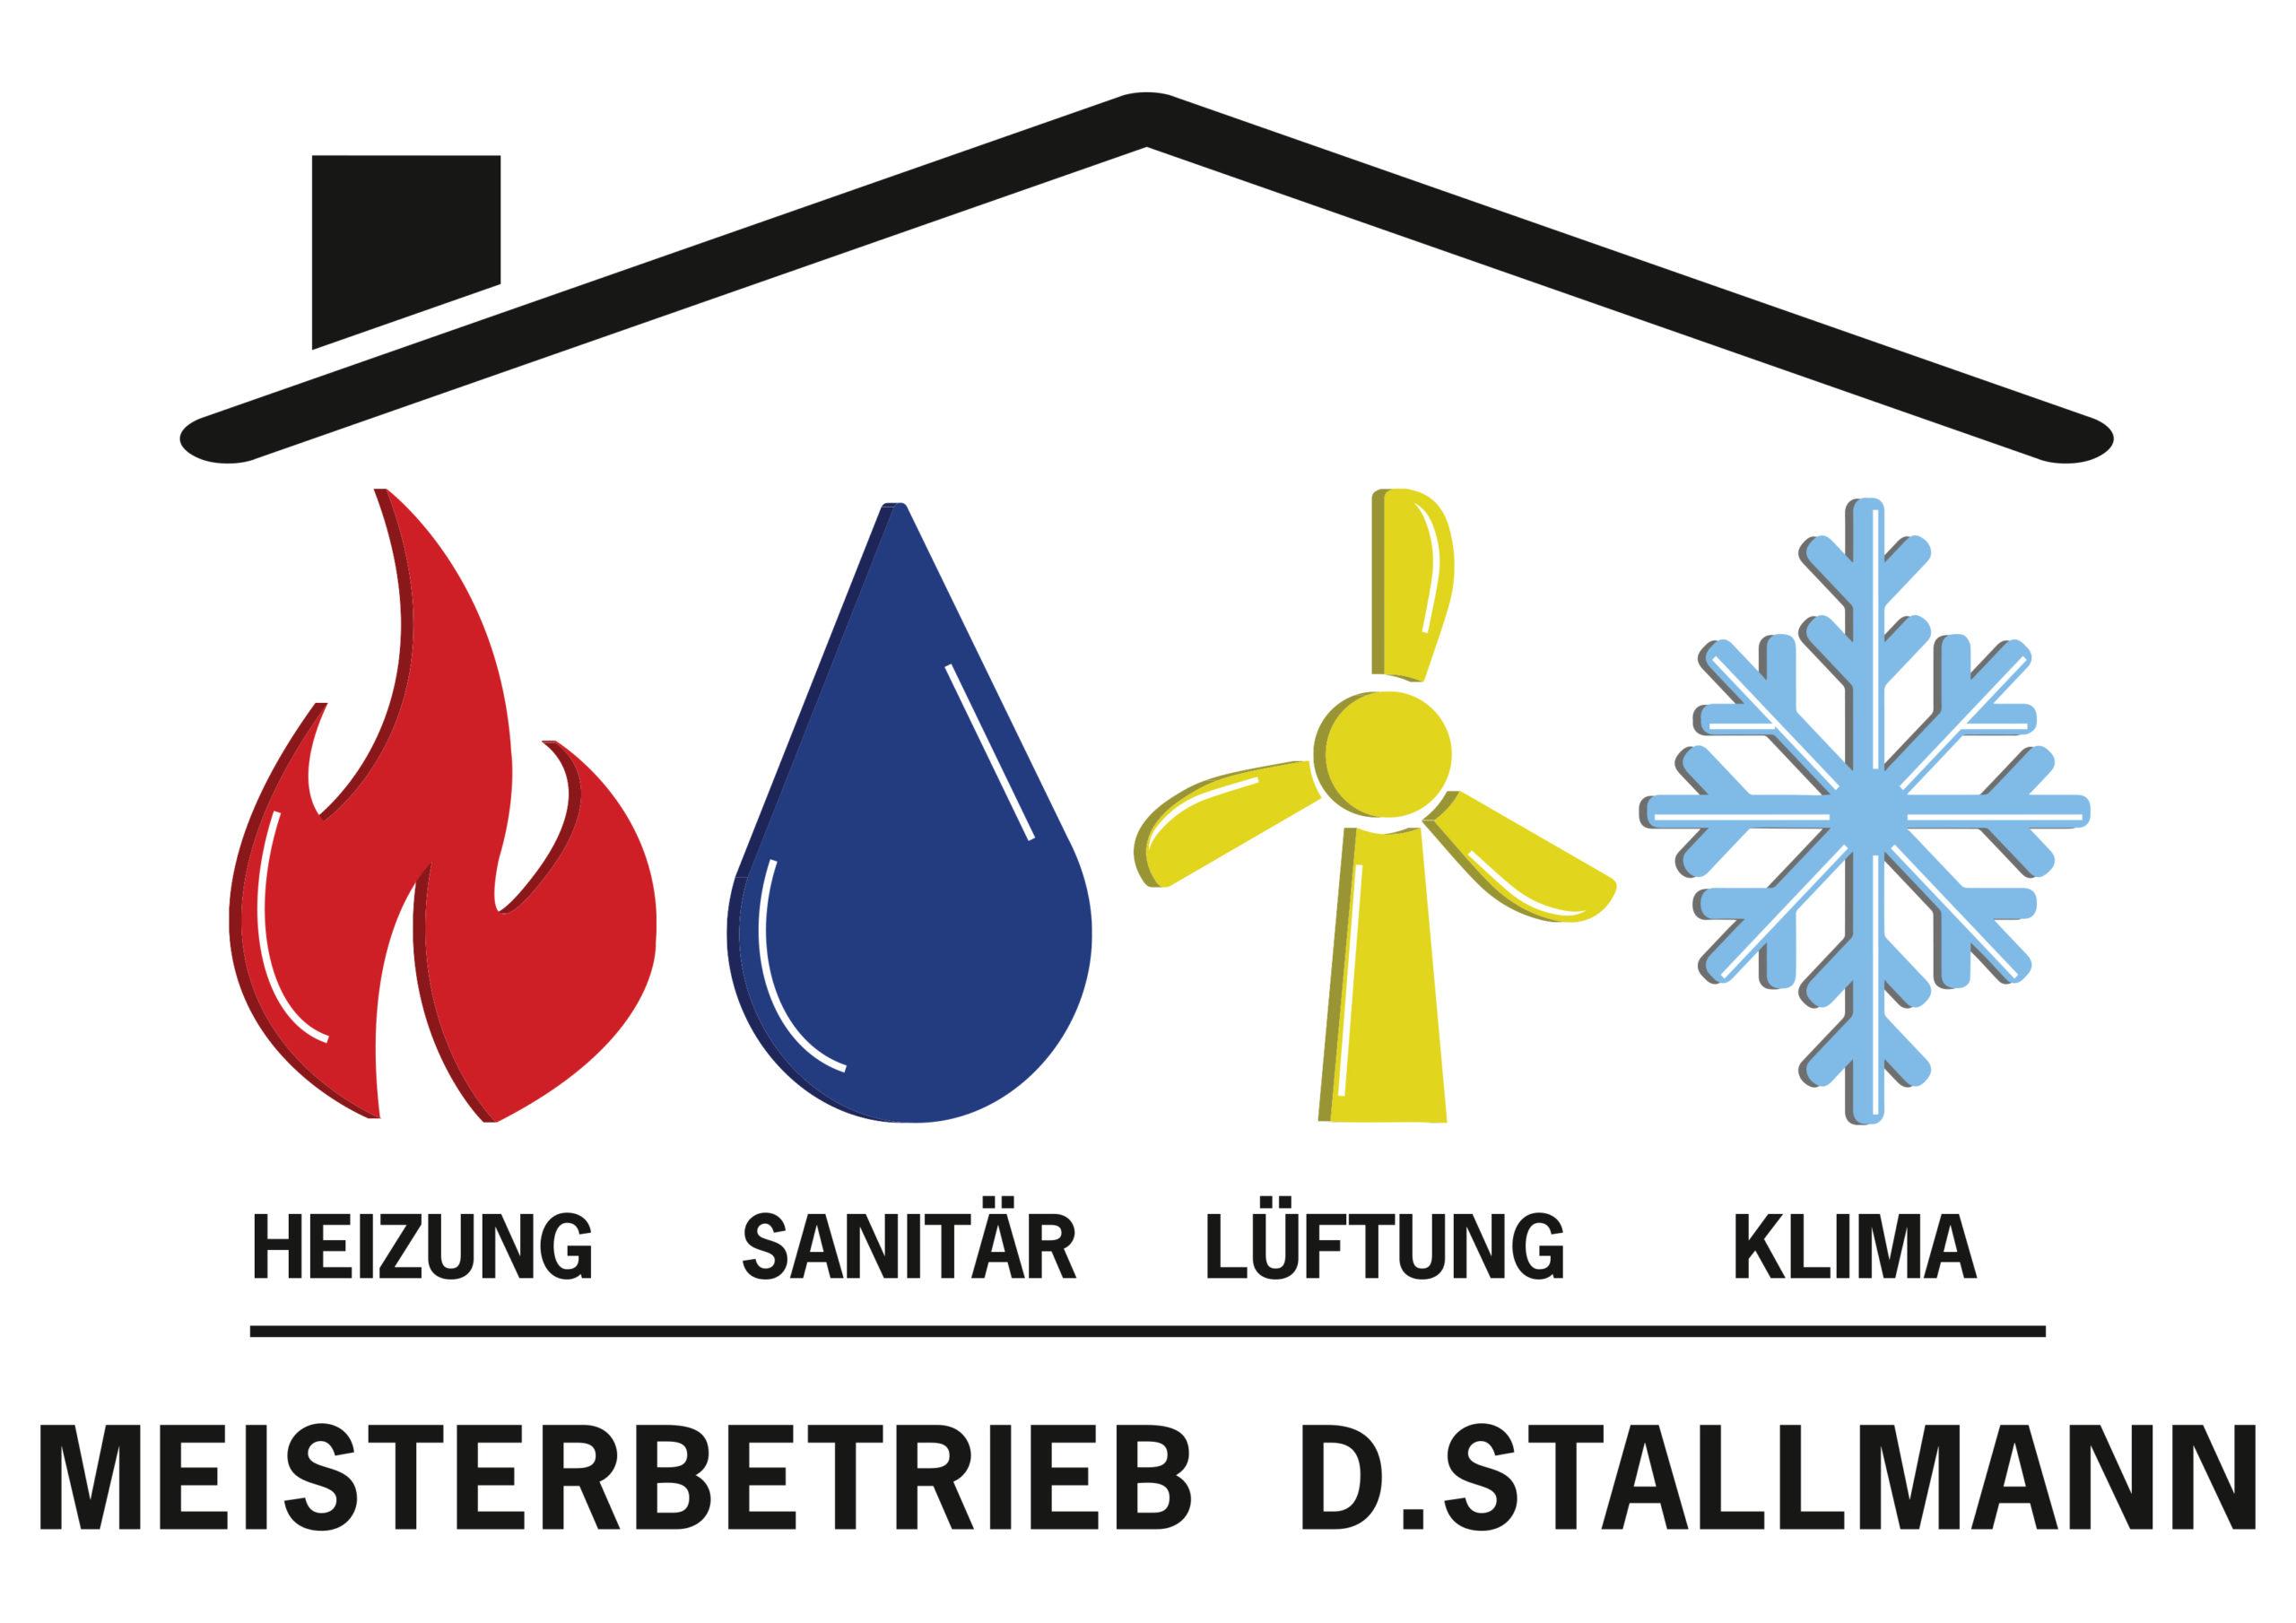 SHK-Stallmann - Meisterbetrieb D. Stallmann